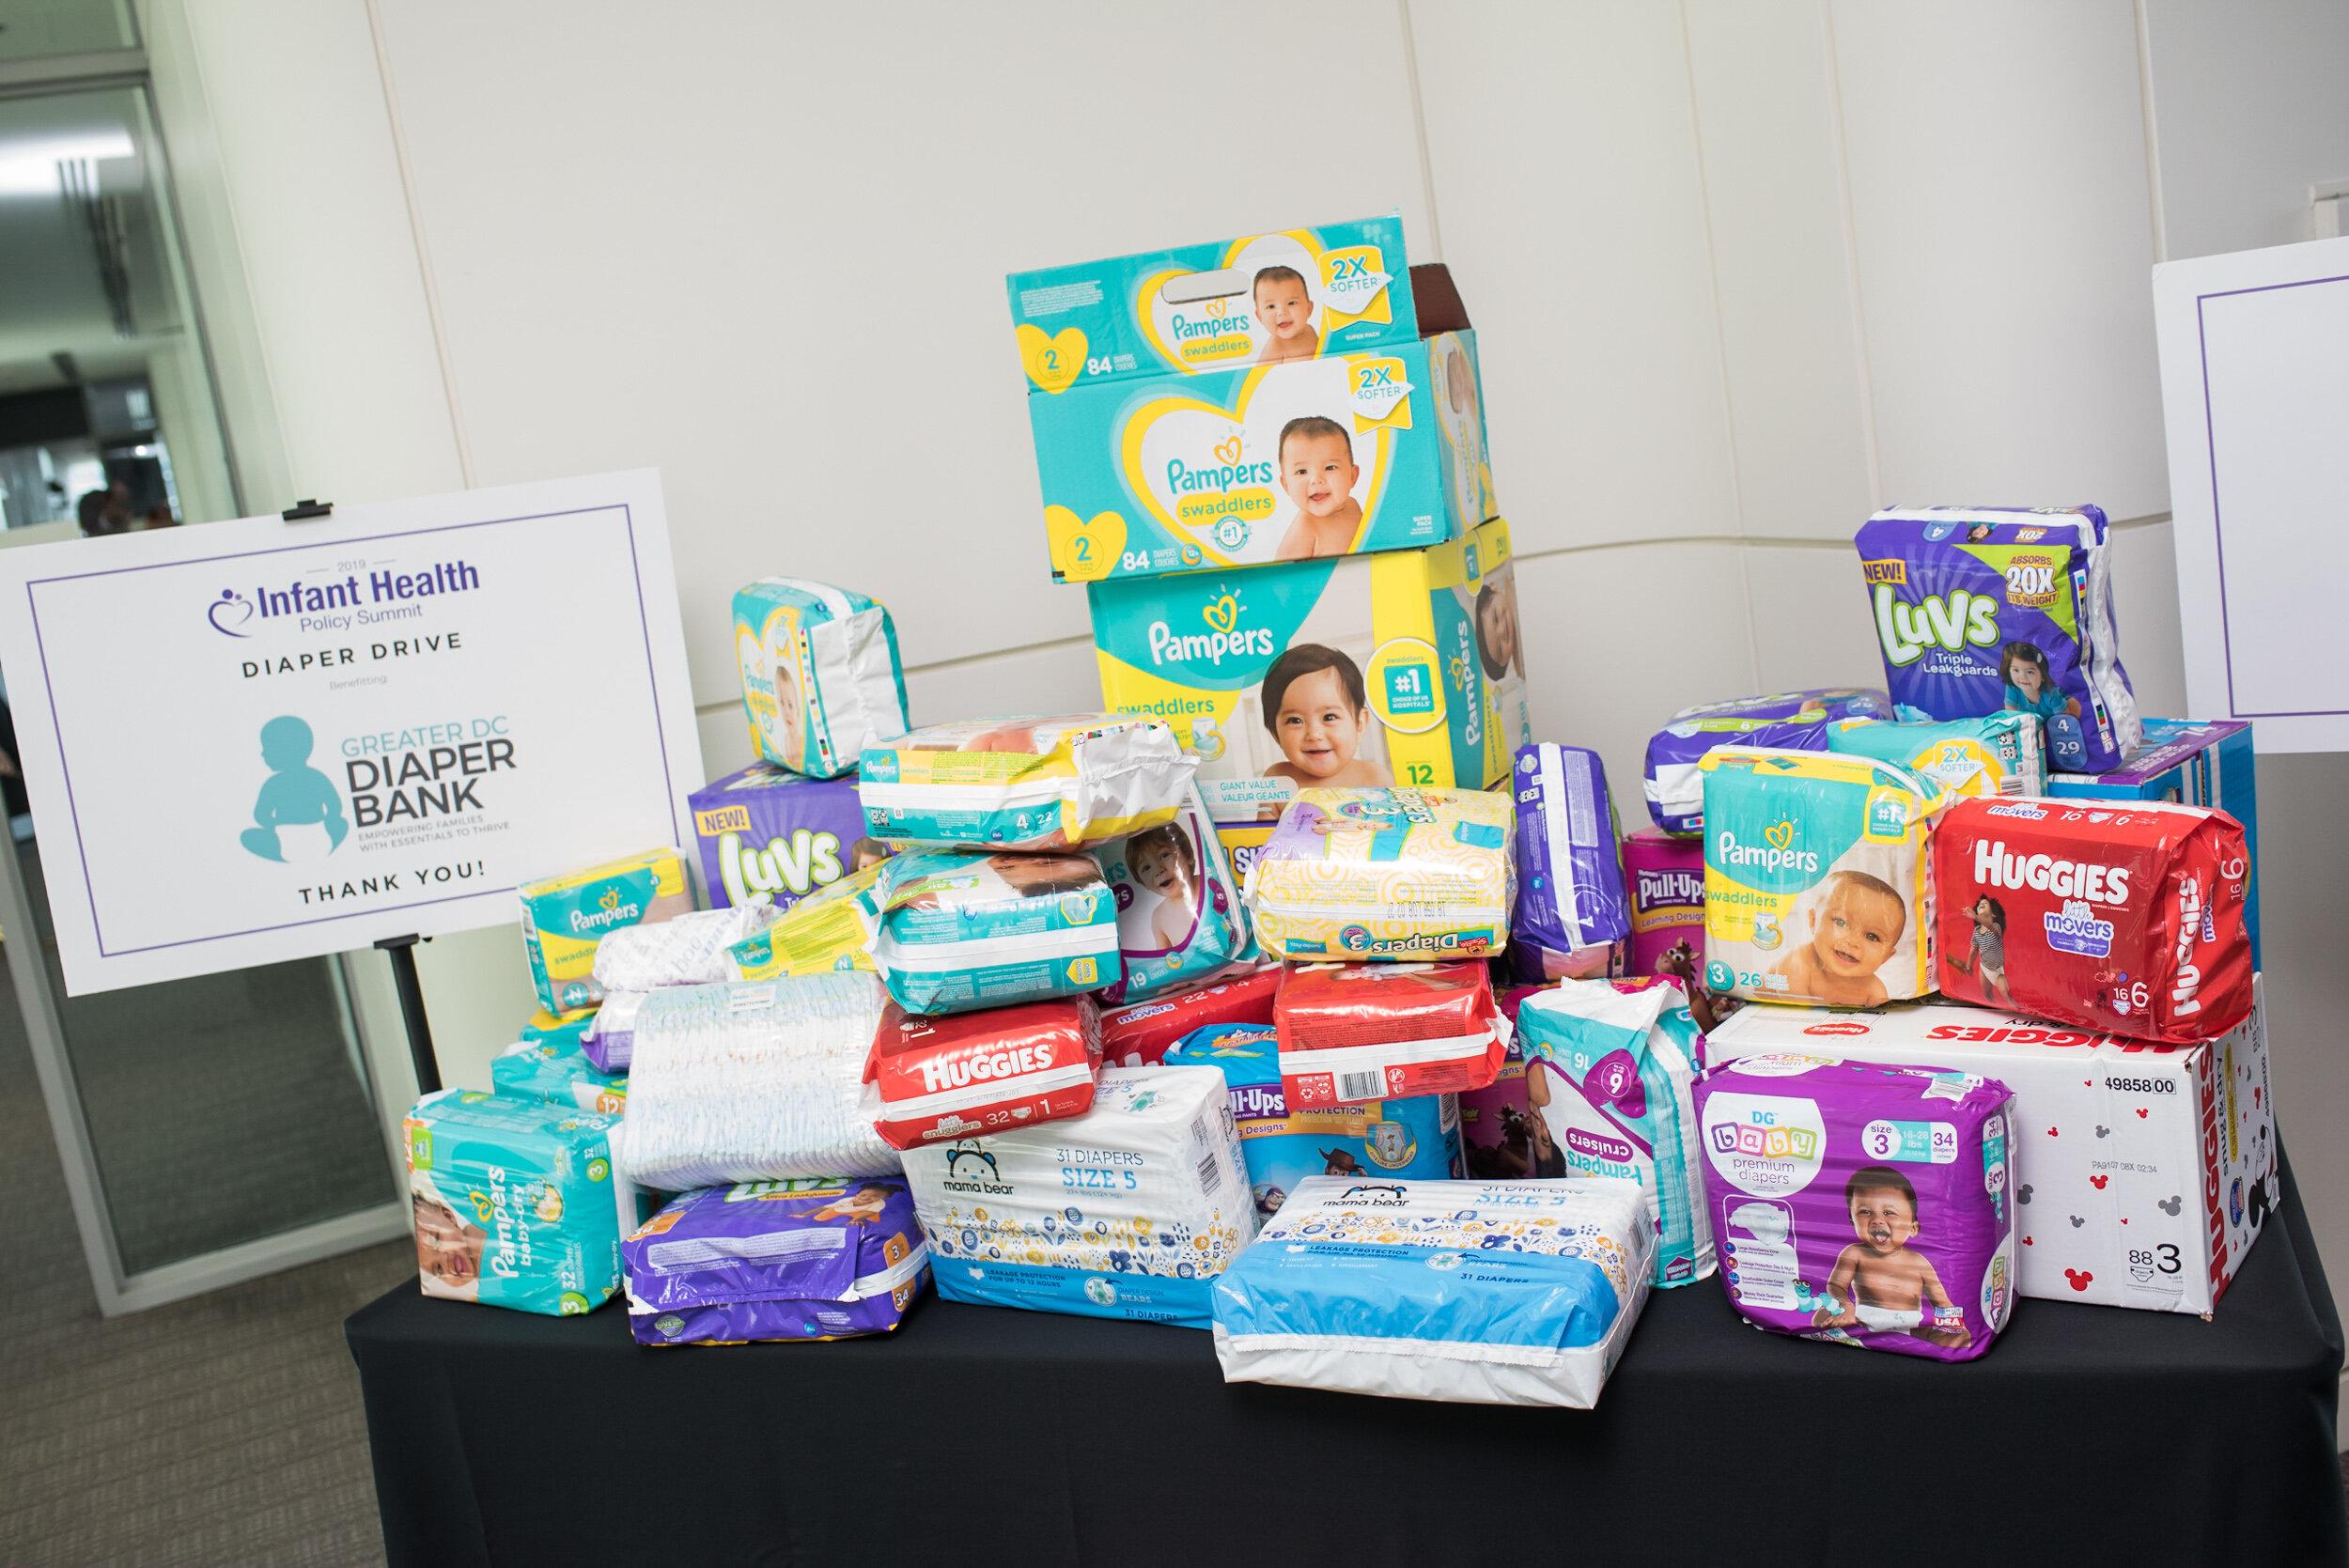 AfPA Infant Health Summit - Jason Dixson Photography - 190912 - 105740 - 3431.jpg